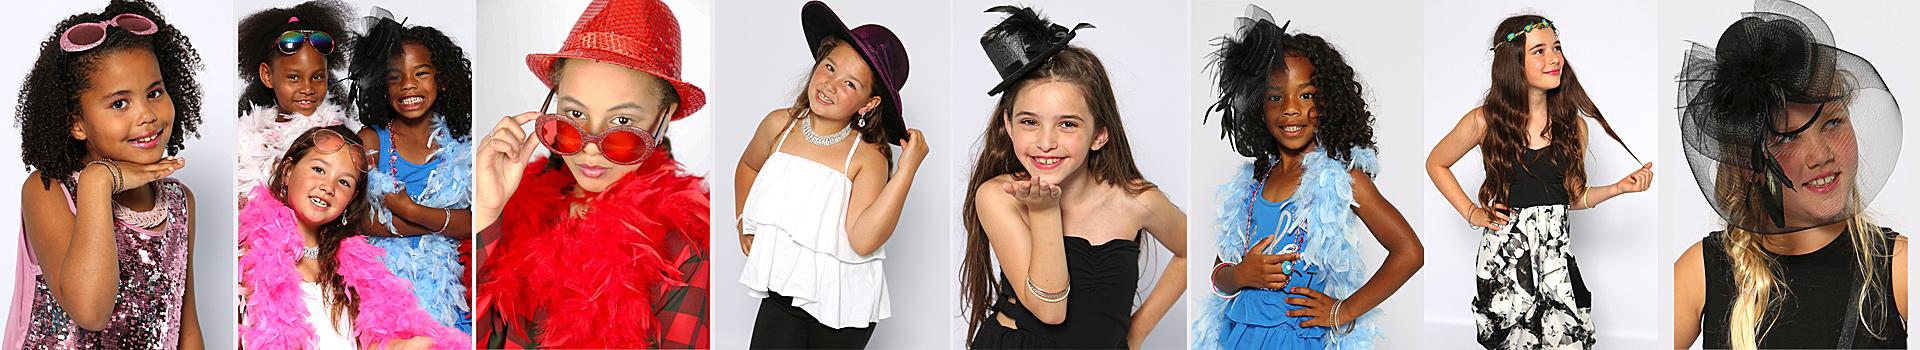 glamour make-up kinderfeestje voor meiden met modelfoto's in Almere bij Star for a Moment